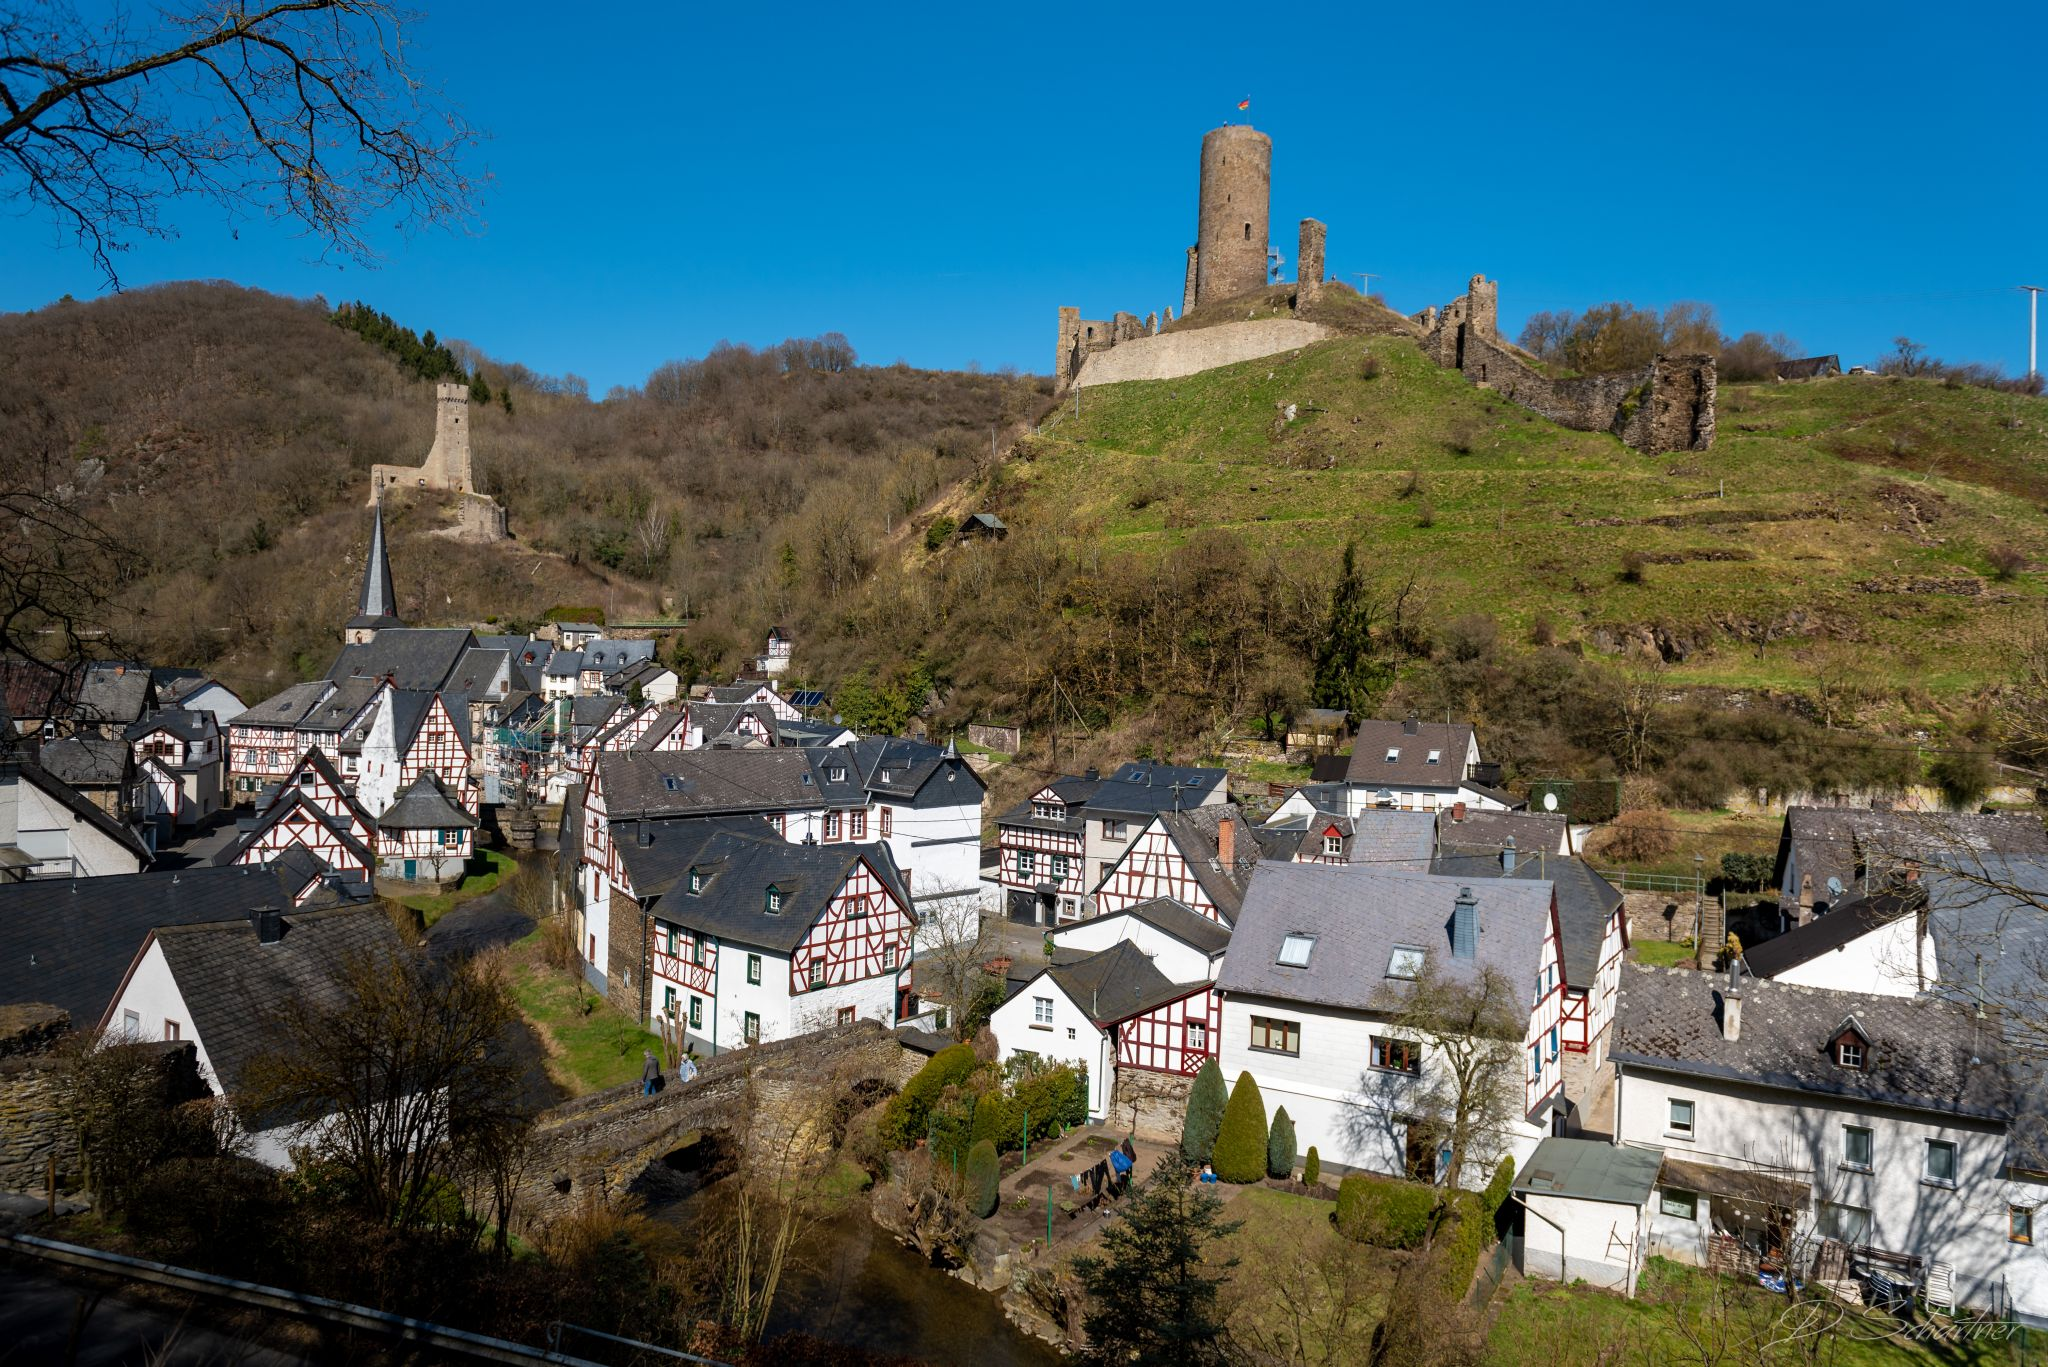 Monreal village, Germany